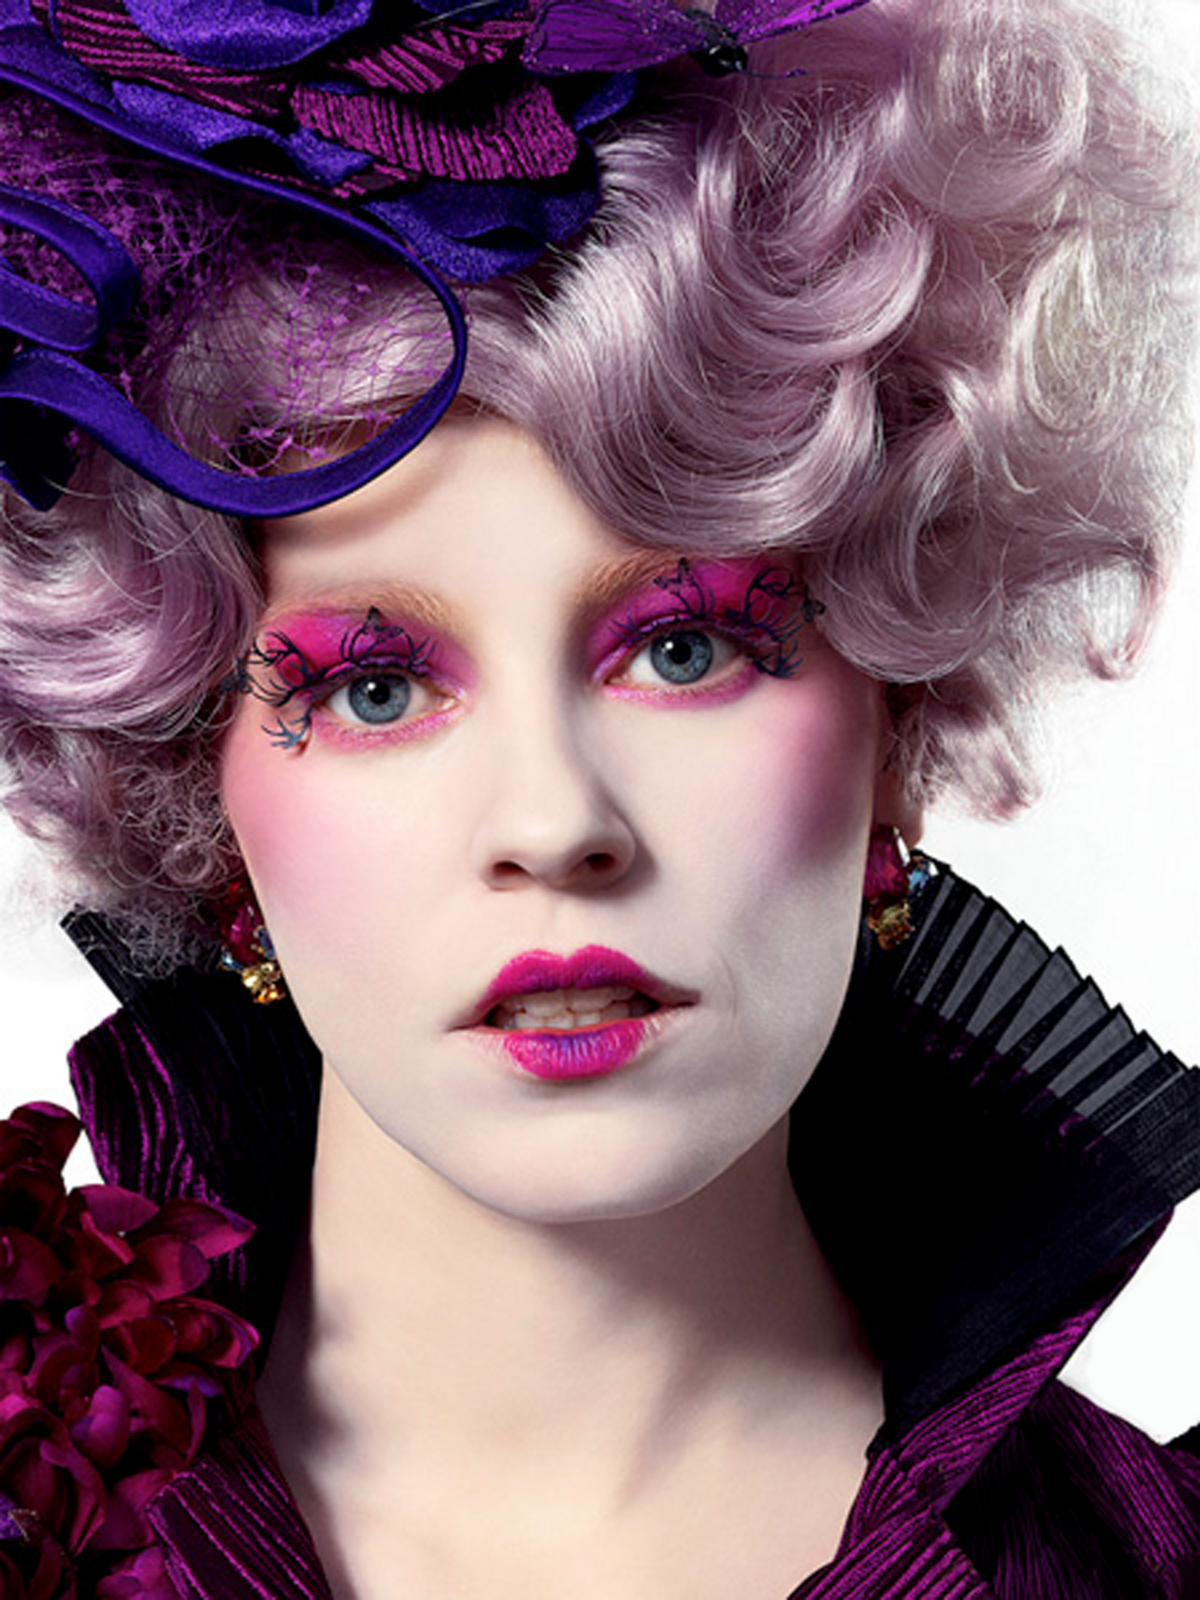 Hunger Games Inspired Make-Up